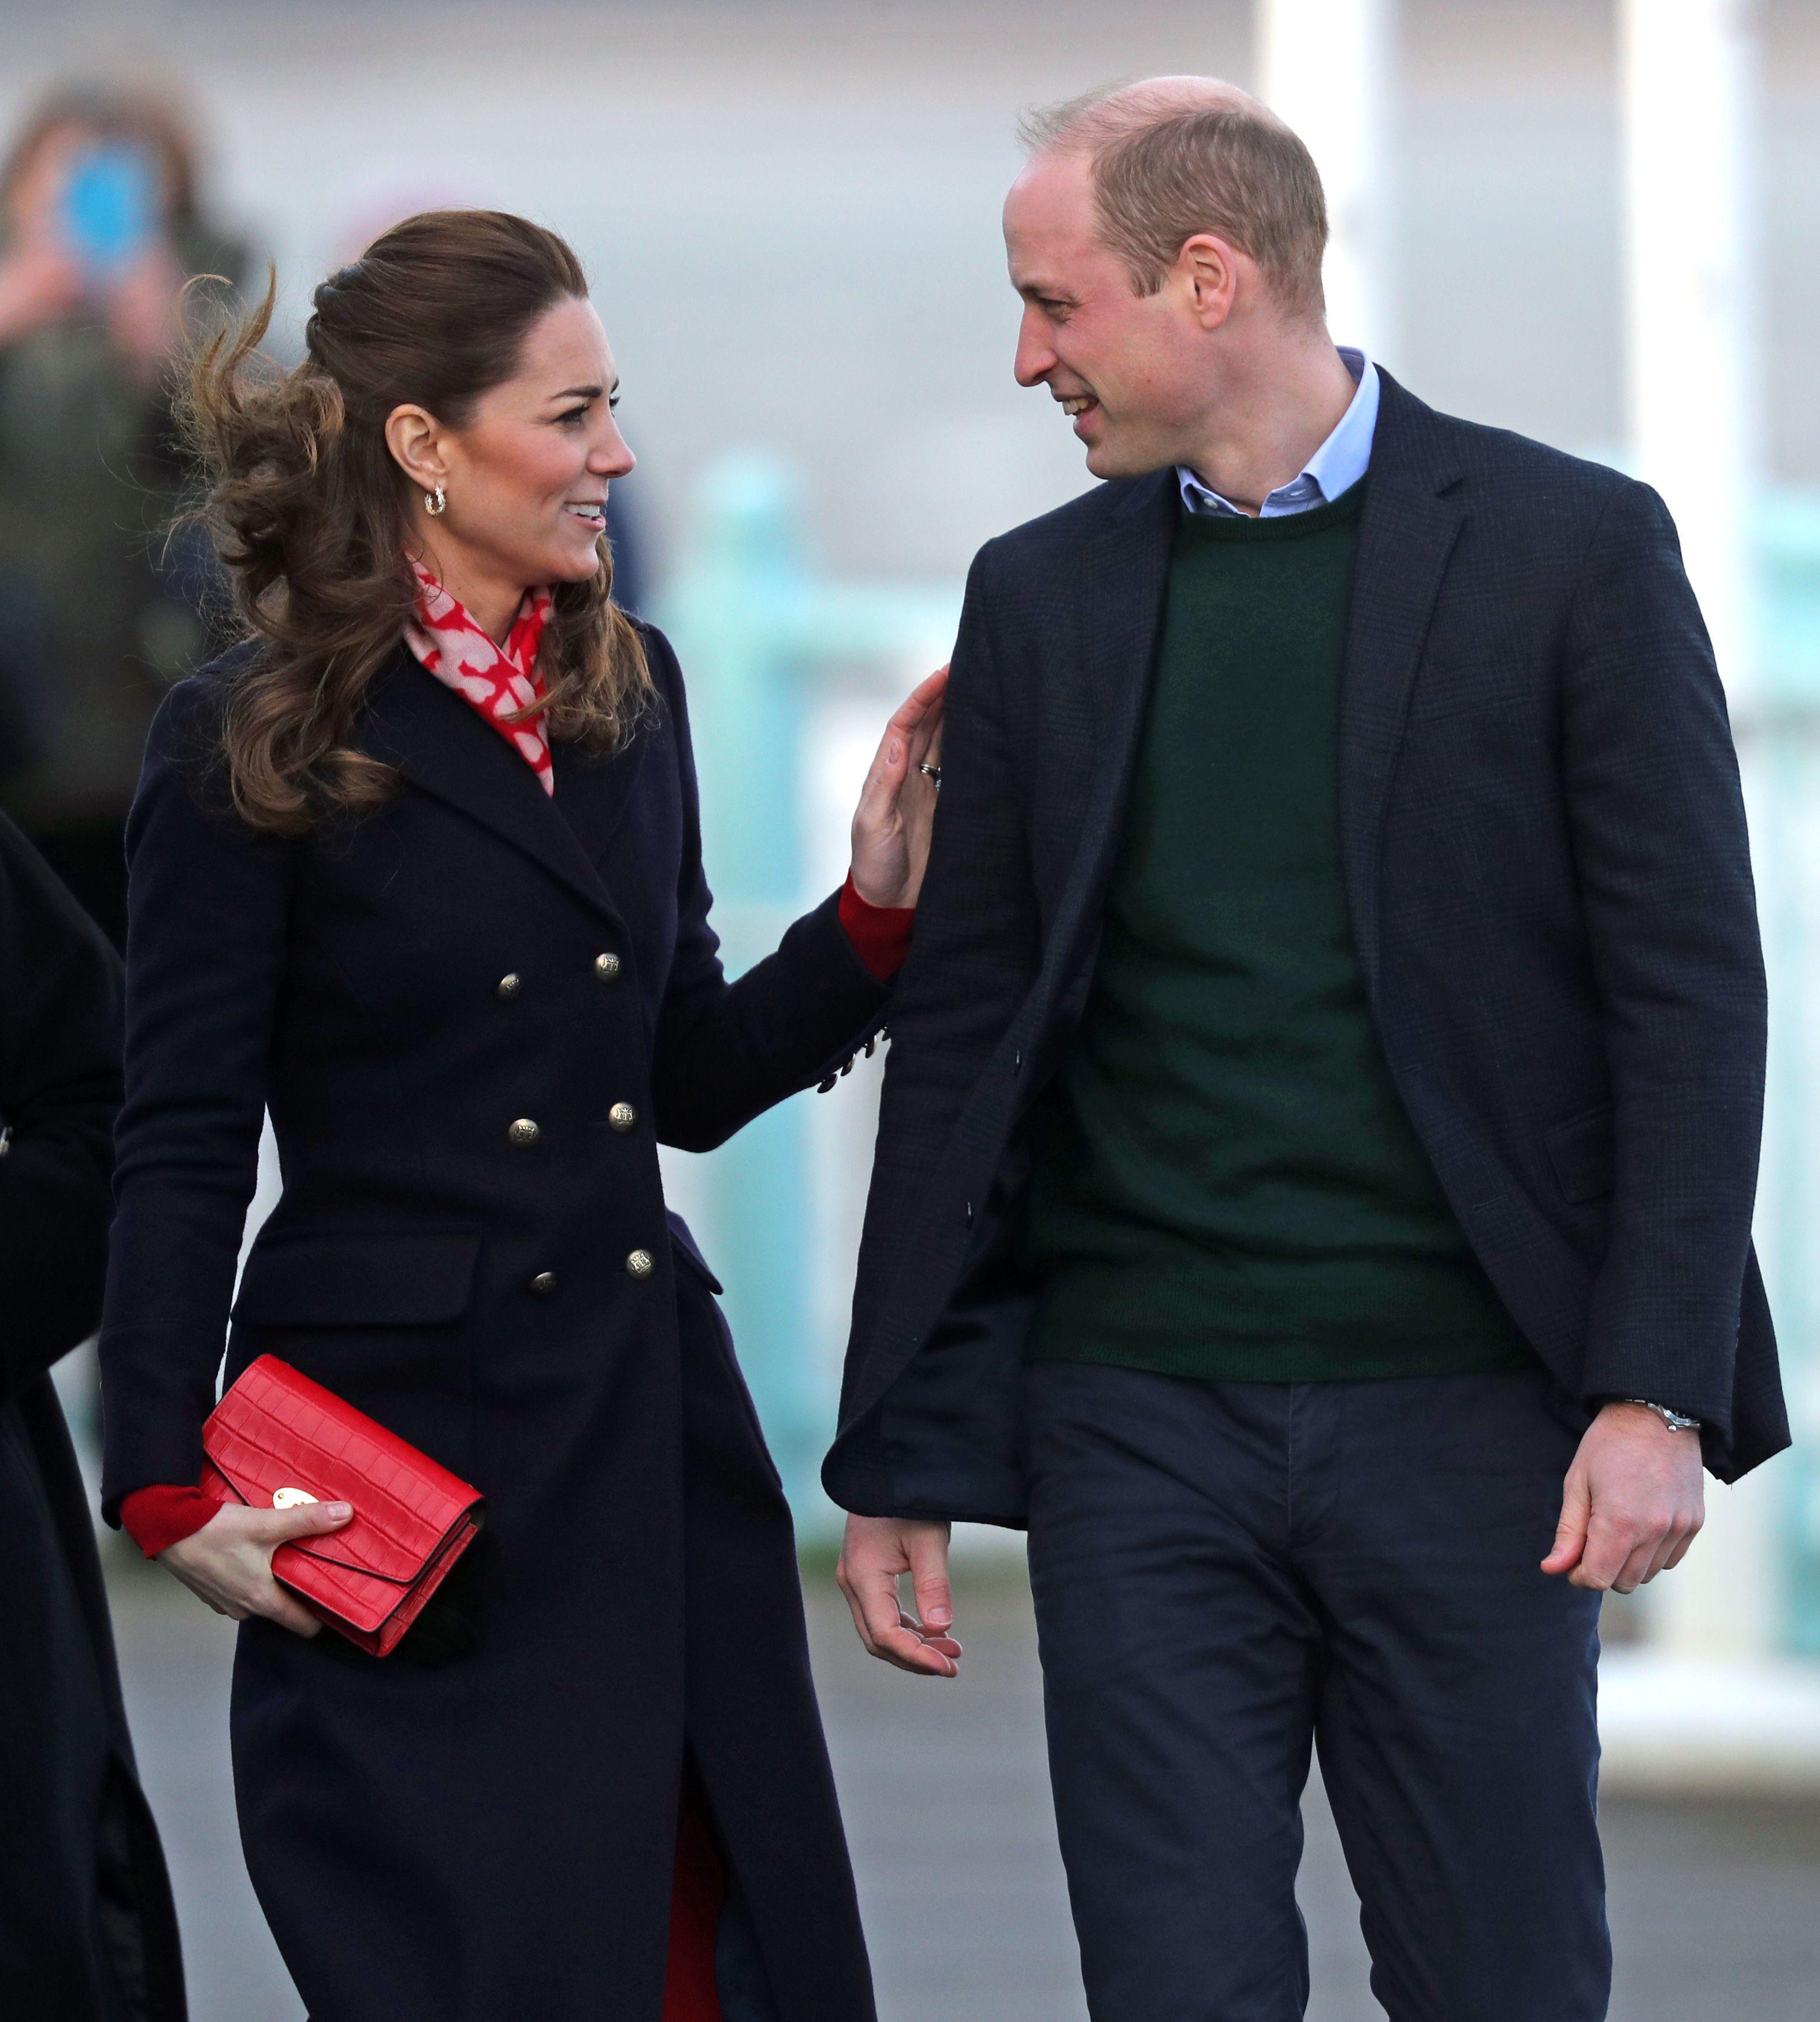 The Duke And Duchess Of Cambridge Prince William And Kate Middleton Herzogin Kate Prinz William Und Kate Prinz William